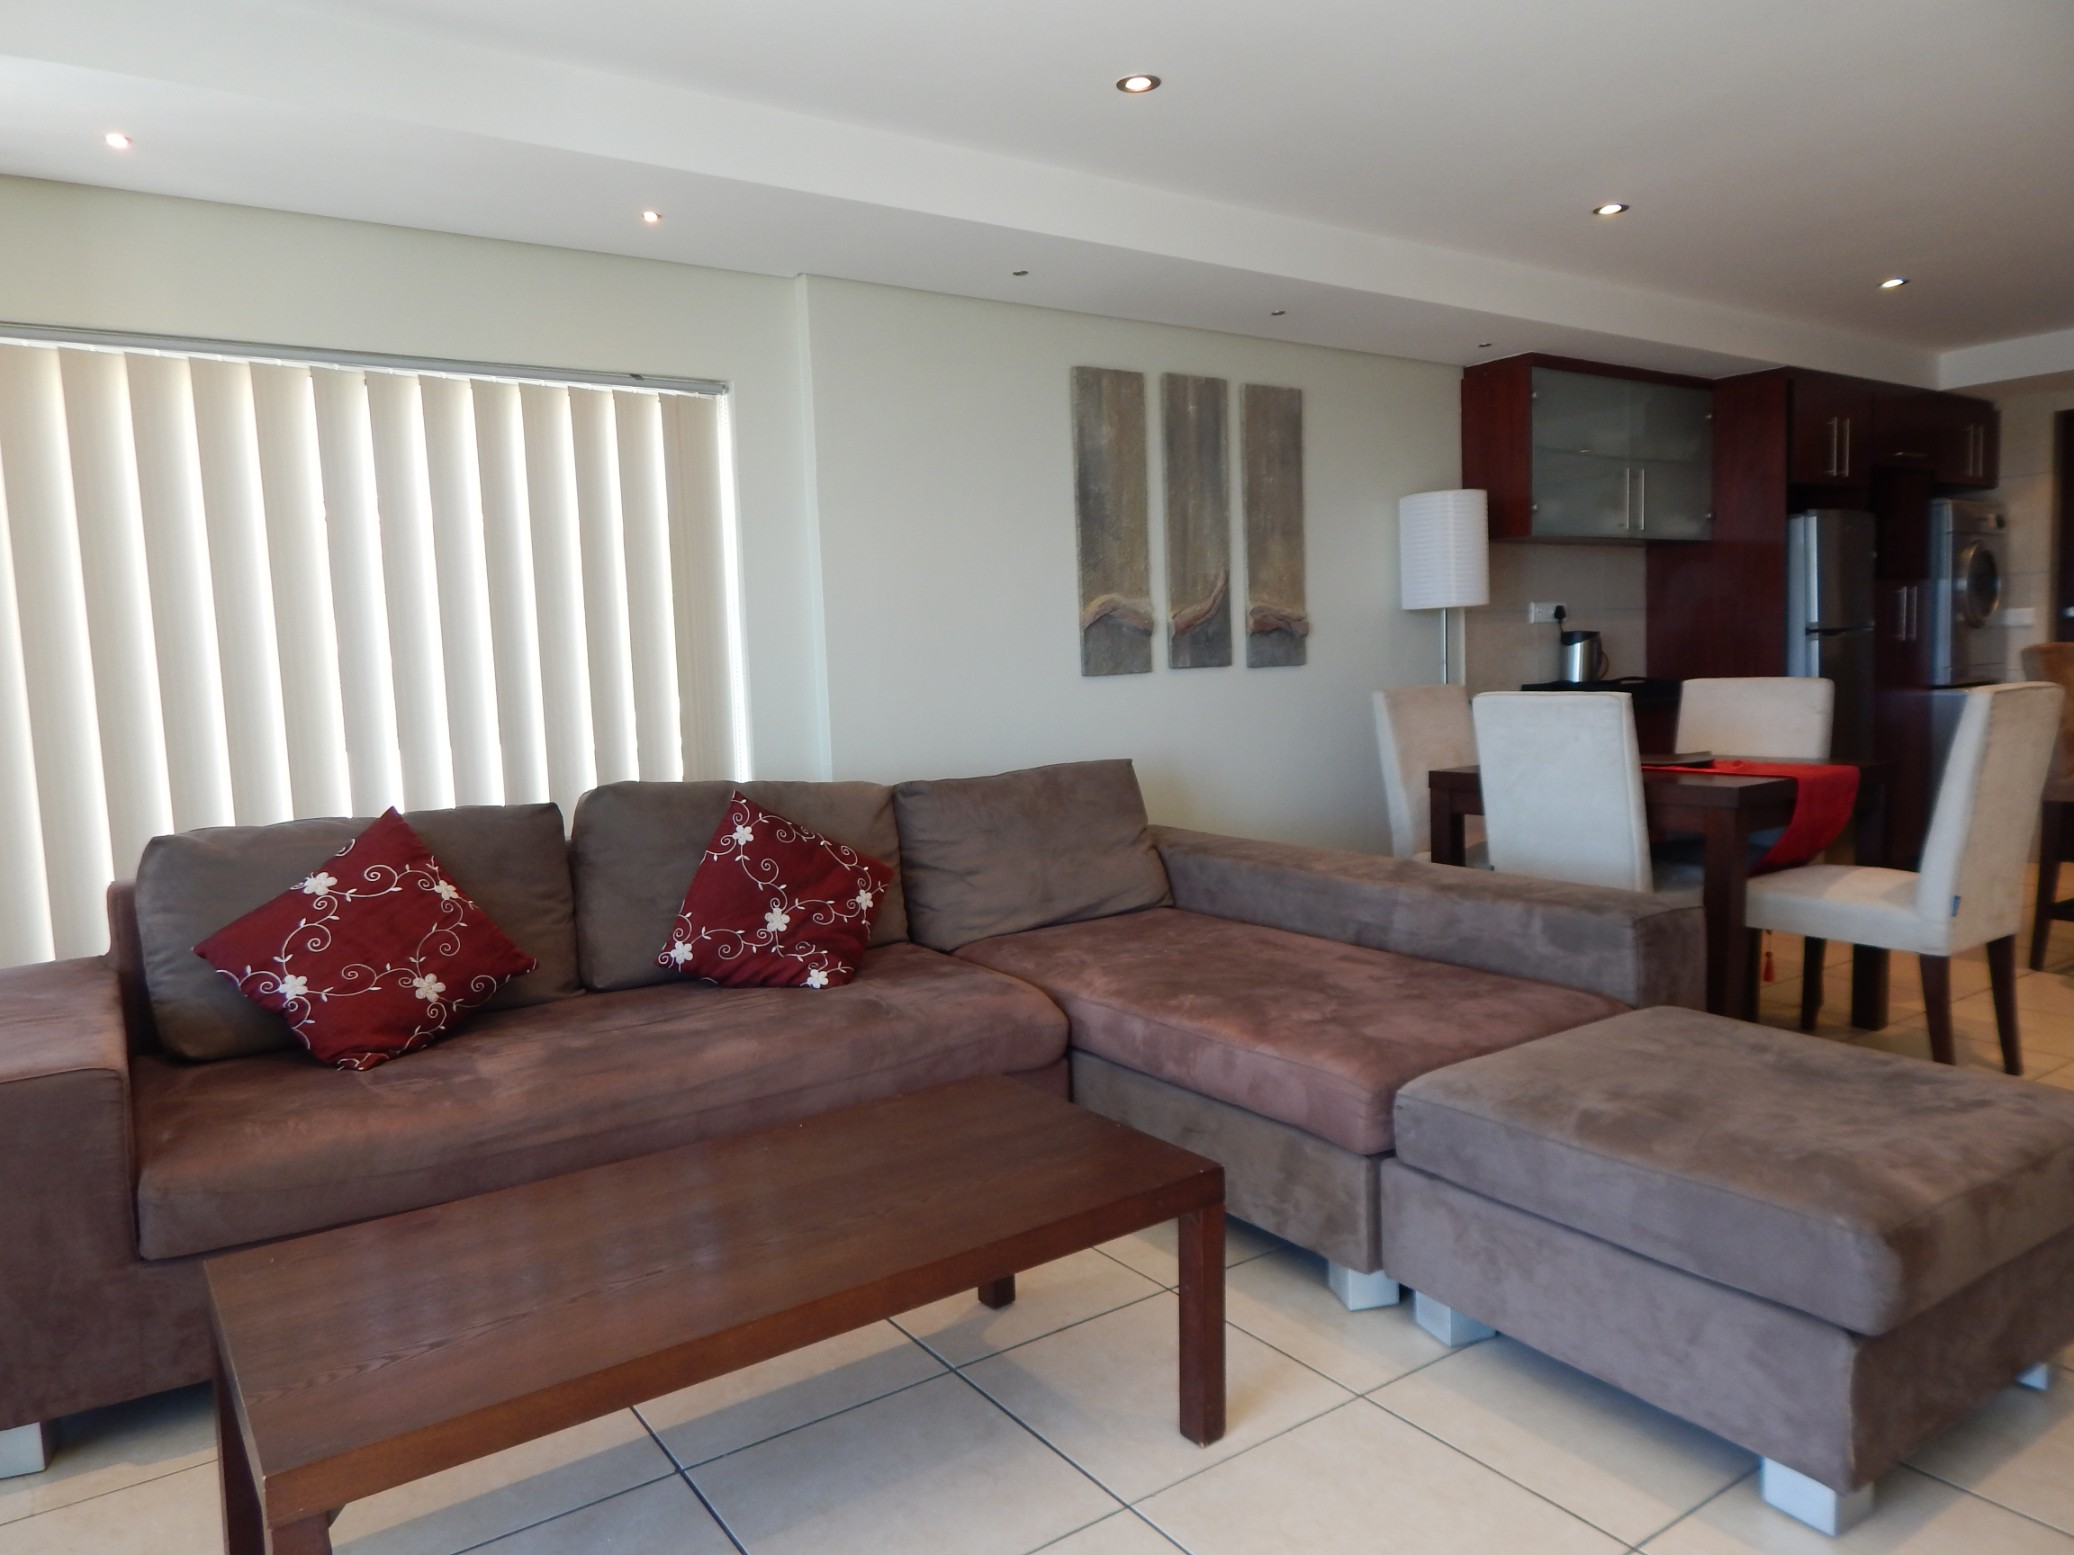 2 Bedroom Apartment for sale in De Bakke ENT0067862 : photo#5